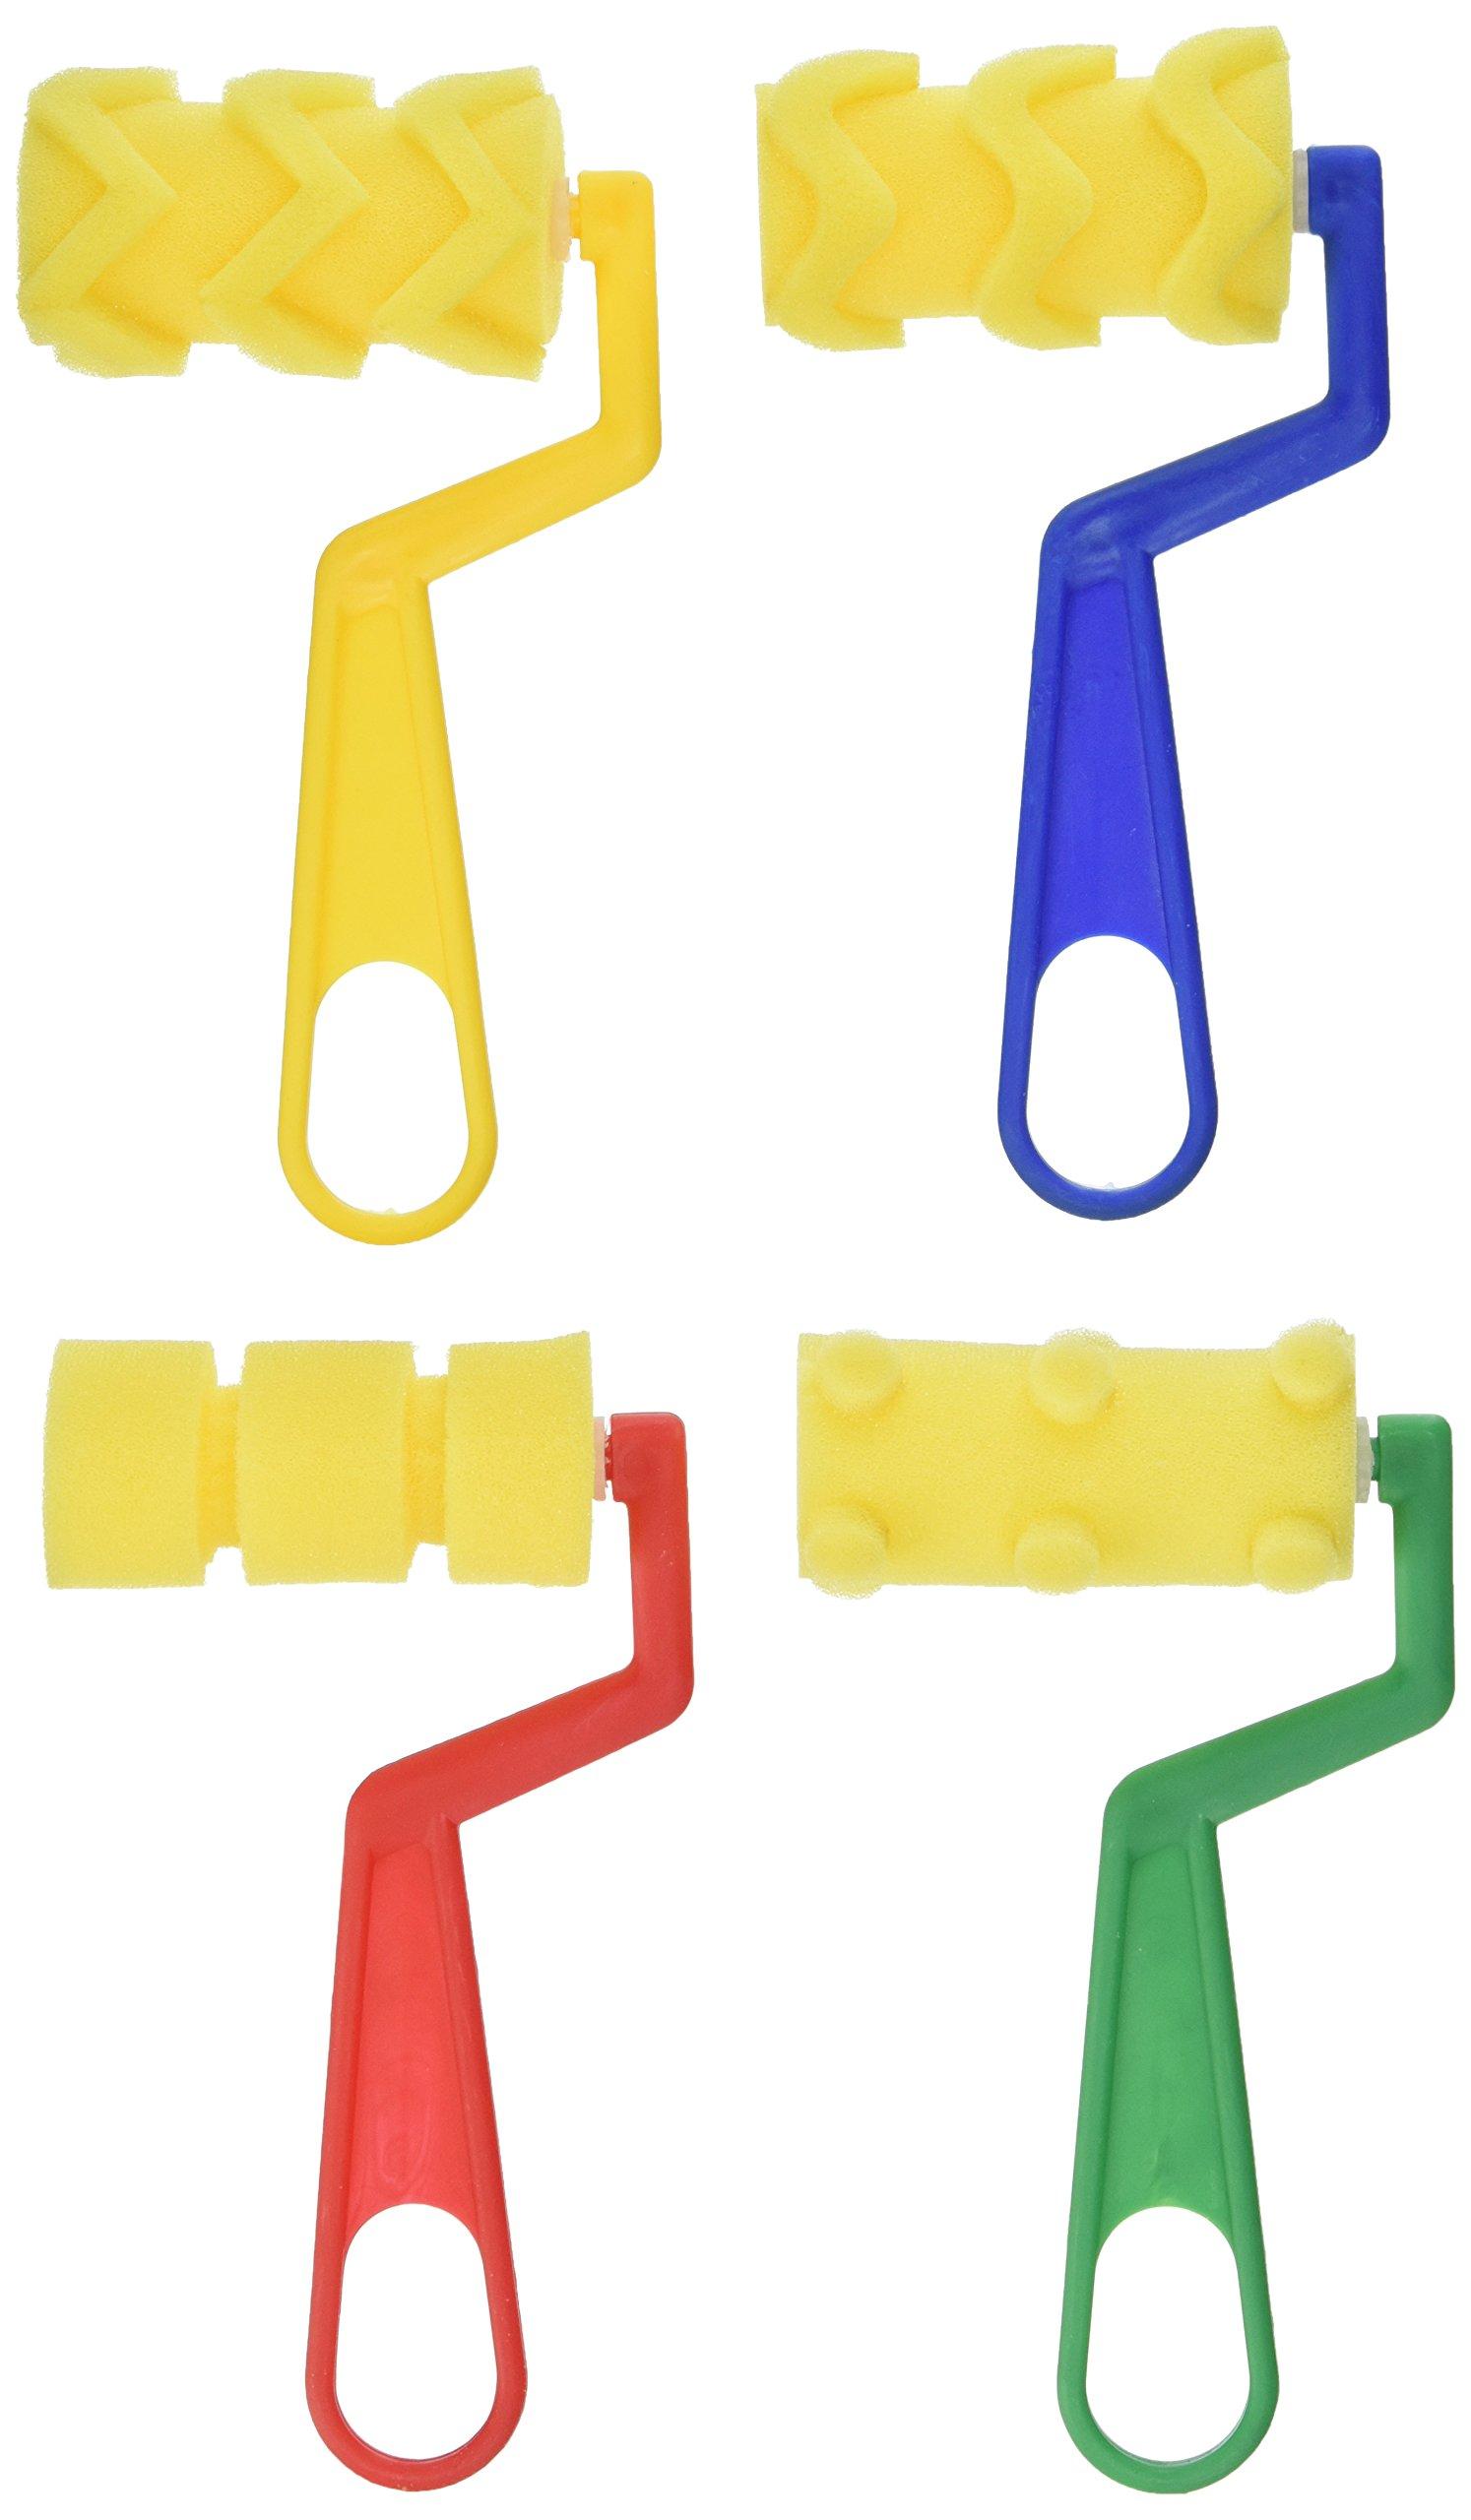 School Smart 85729 Unique Shape Sponge Roller Set - Set of 4 by School Smart